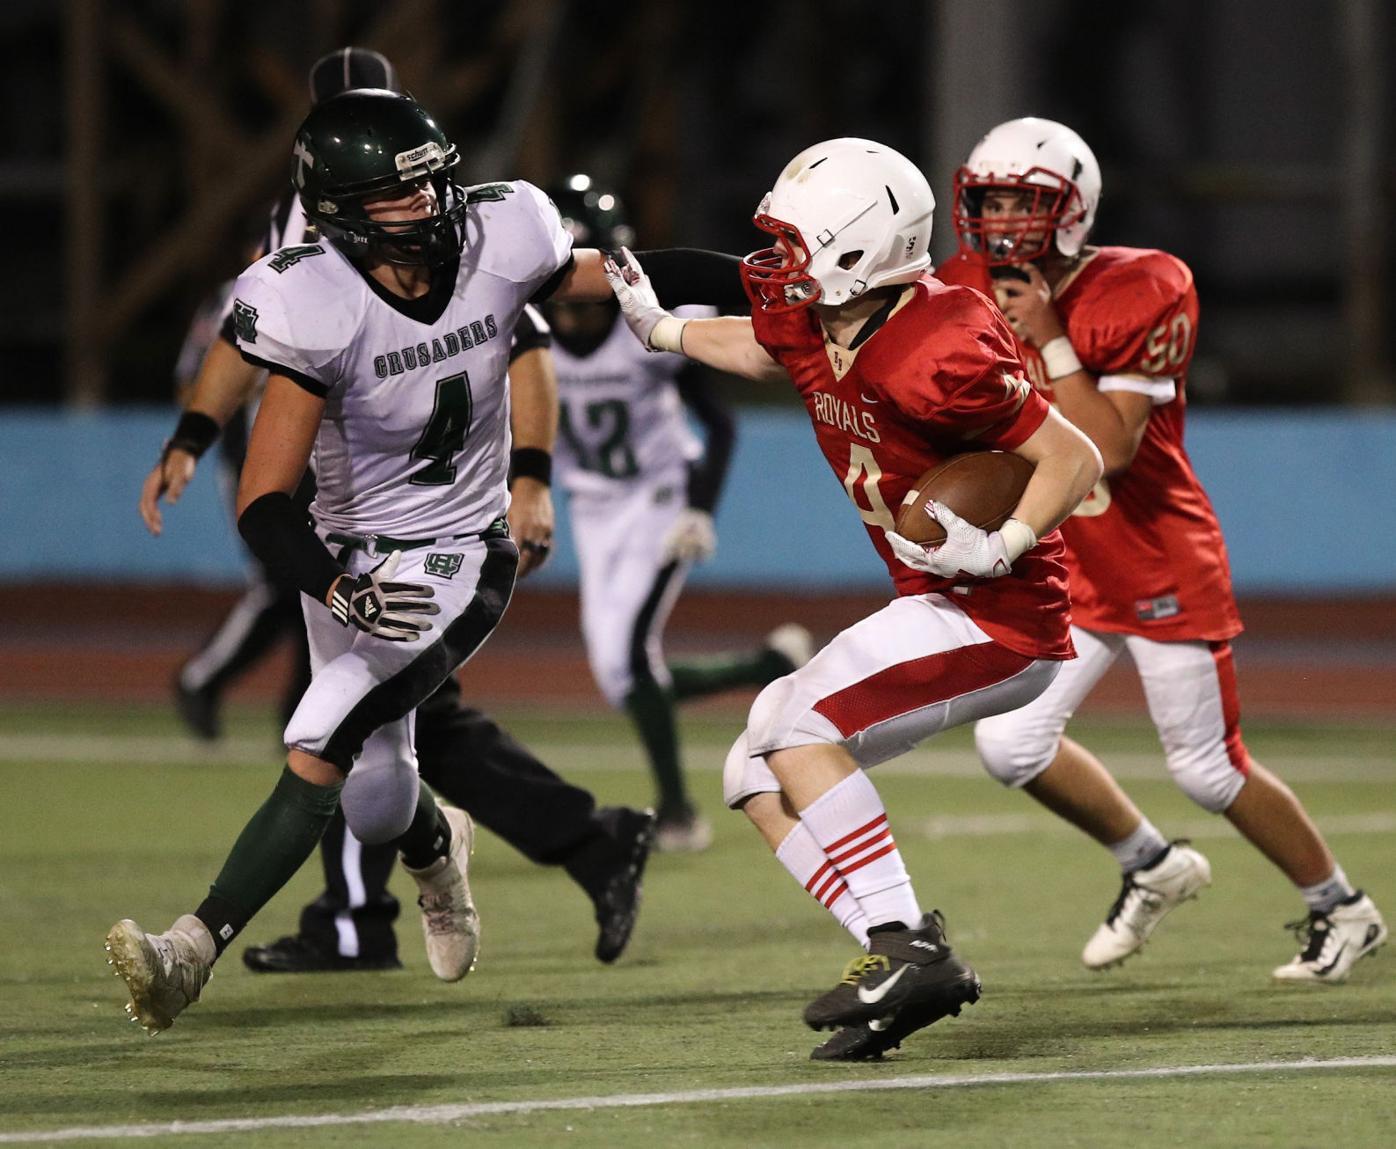 HIGH SCHOOL FOOTBALL: Holy Redeemer vs Holy Cross